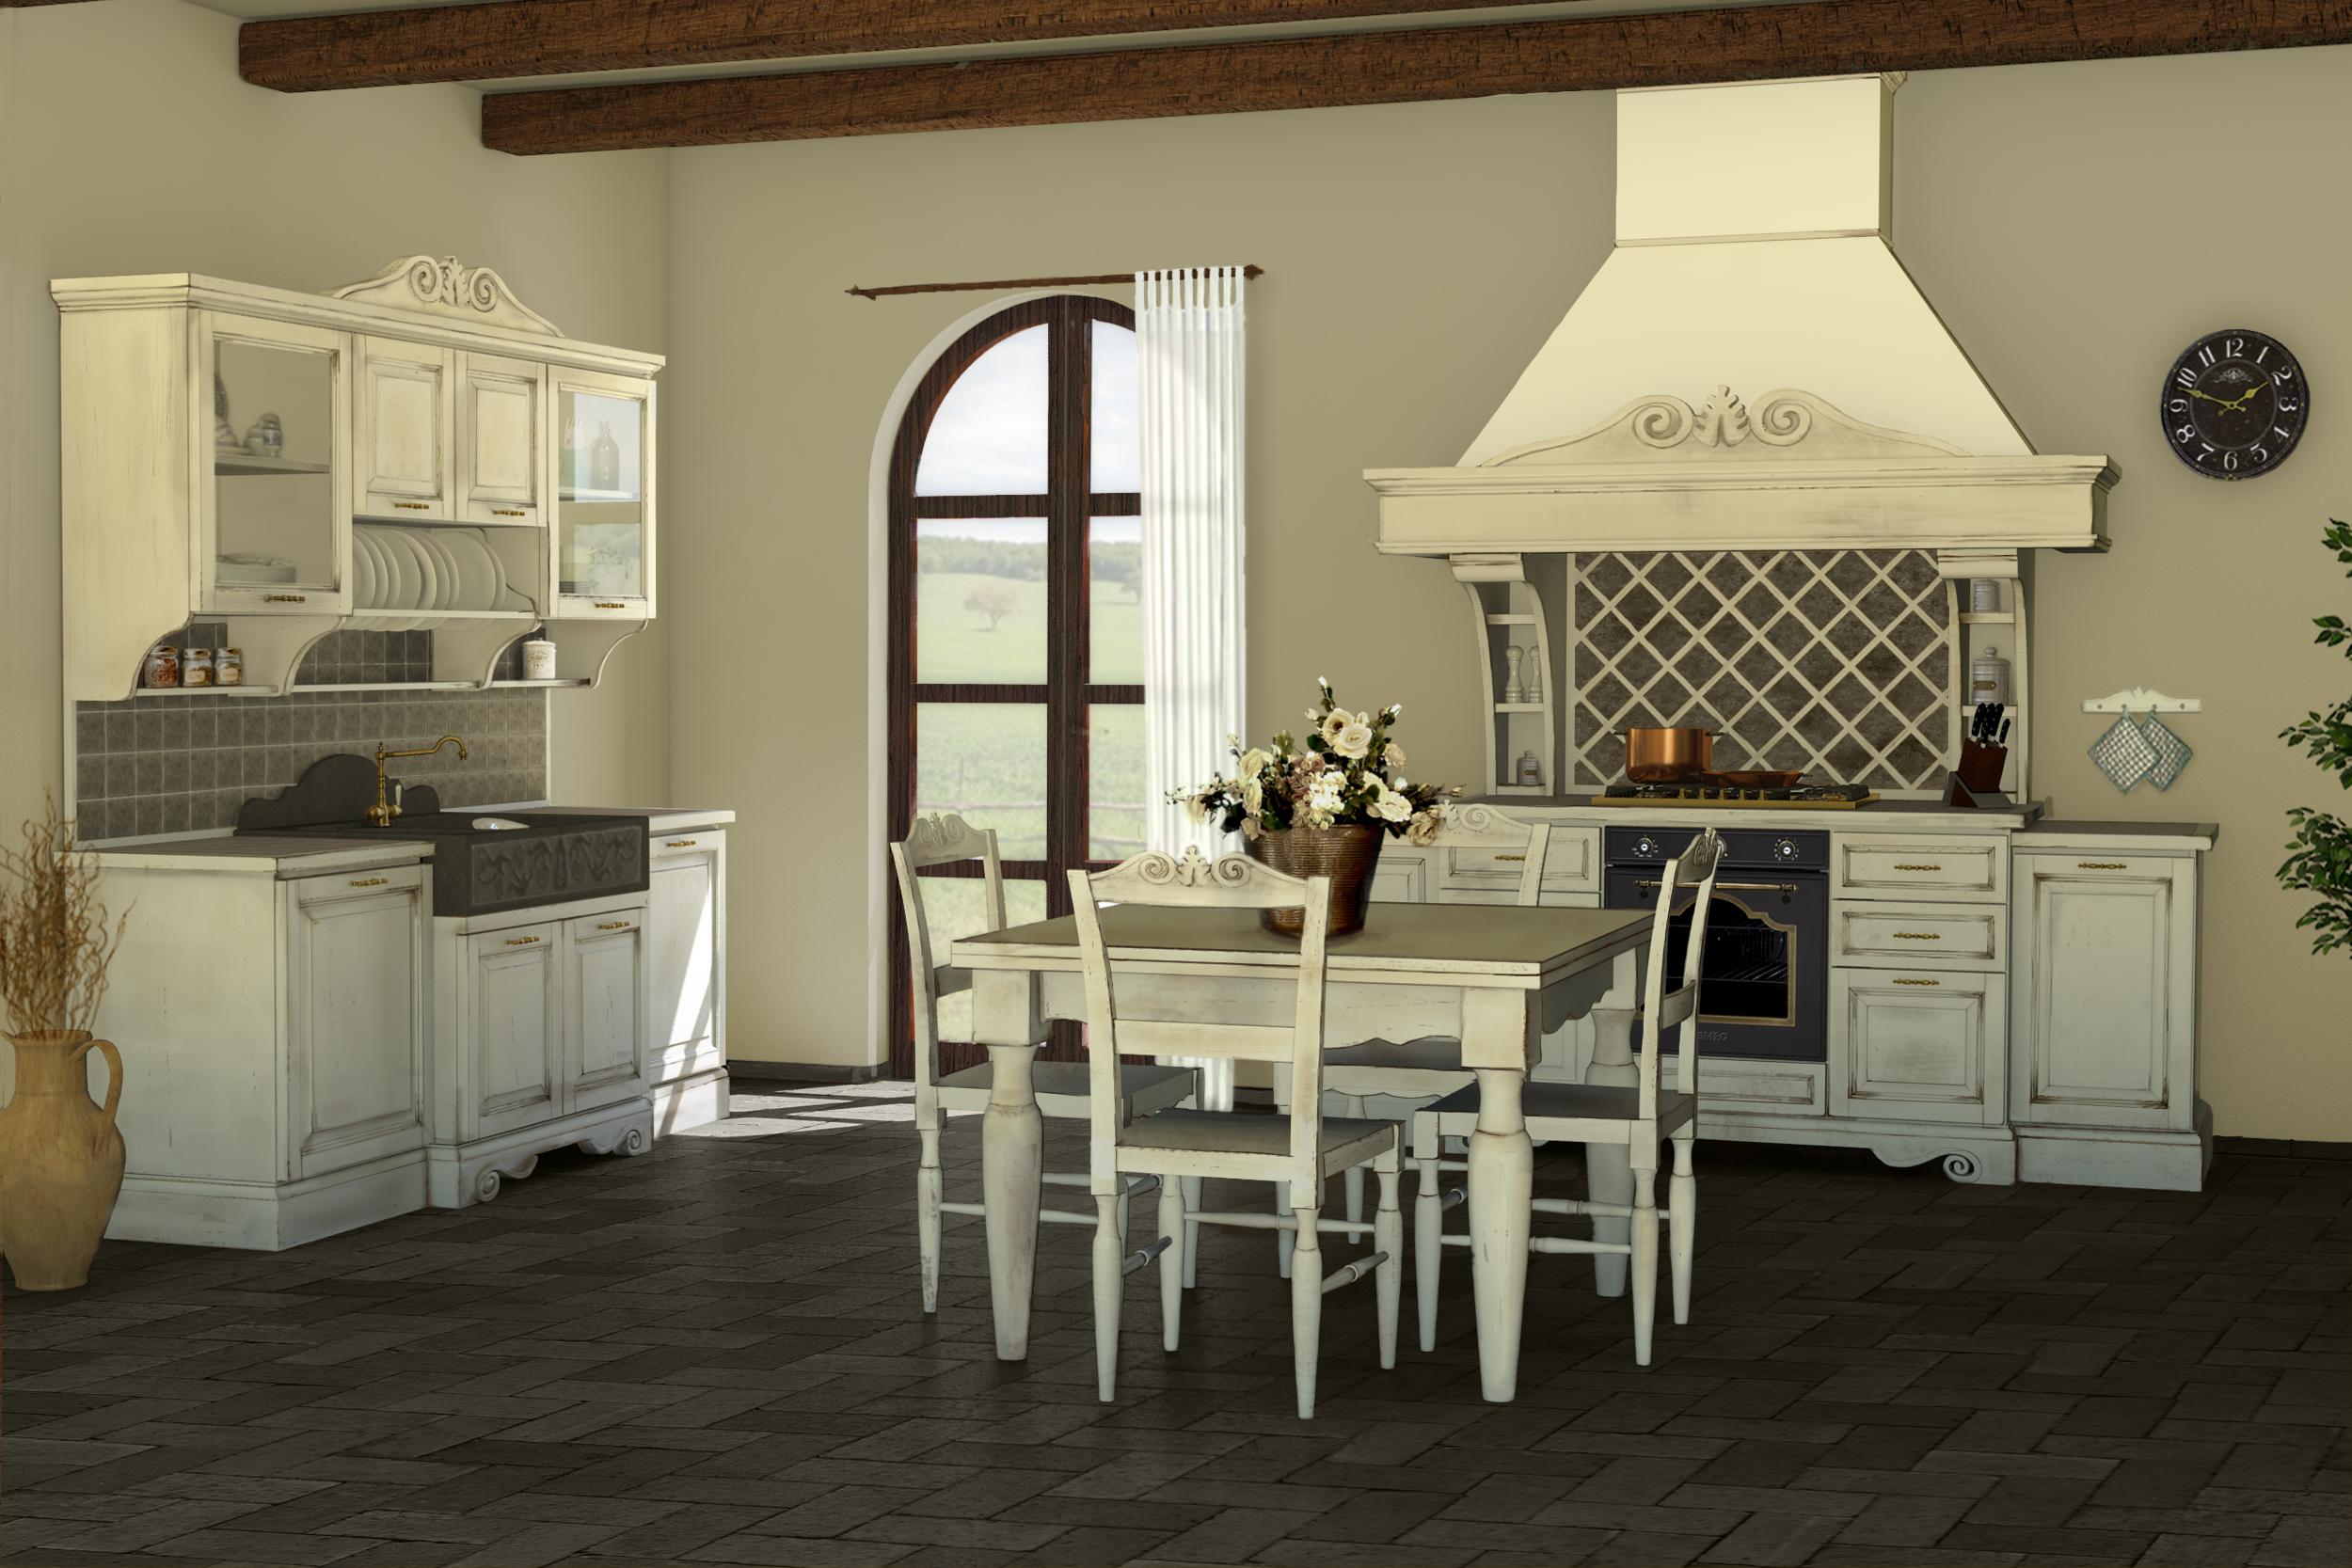 Cucine della nonna cucina classica shabby chic cucina - Cucina in casa ...